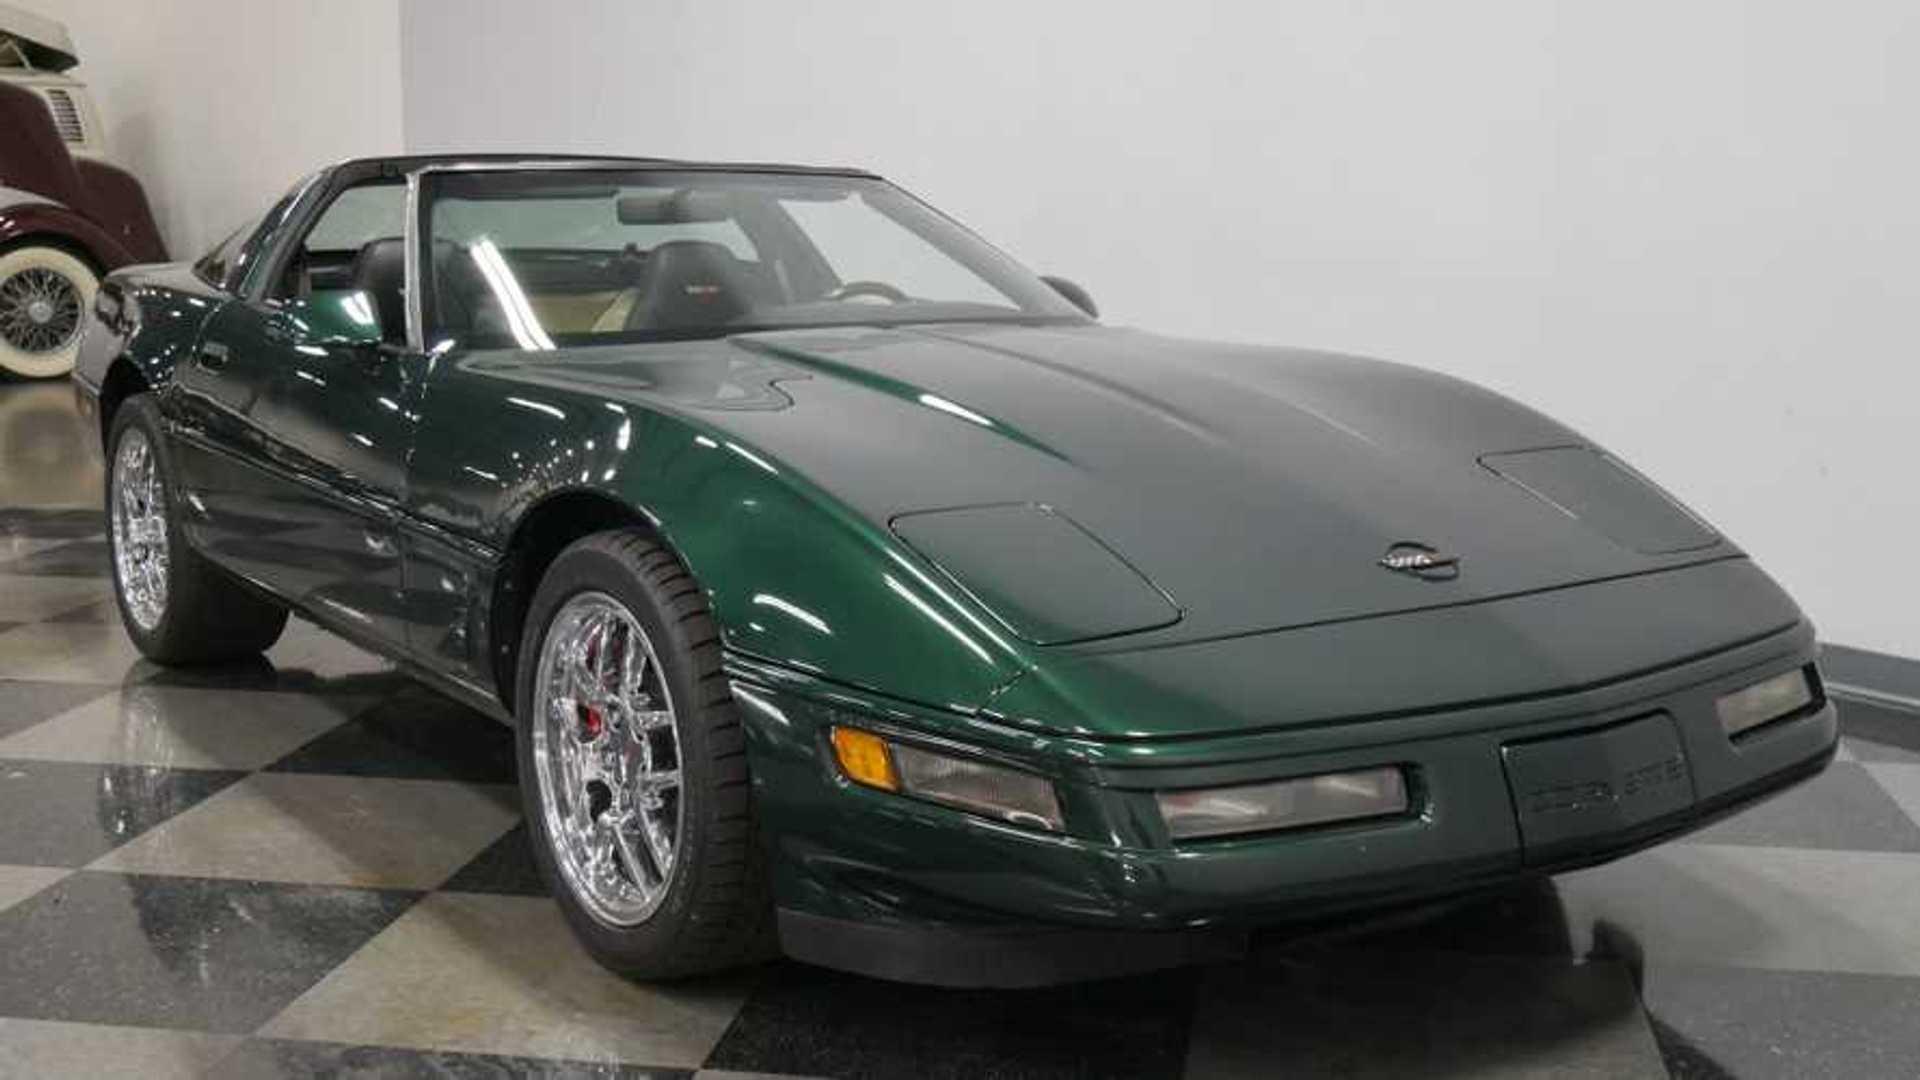 Polo Green 1995 Chevrolet Corvette C4 Is A Real Winner